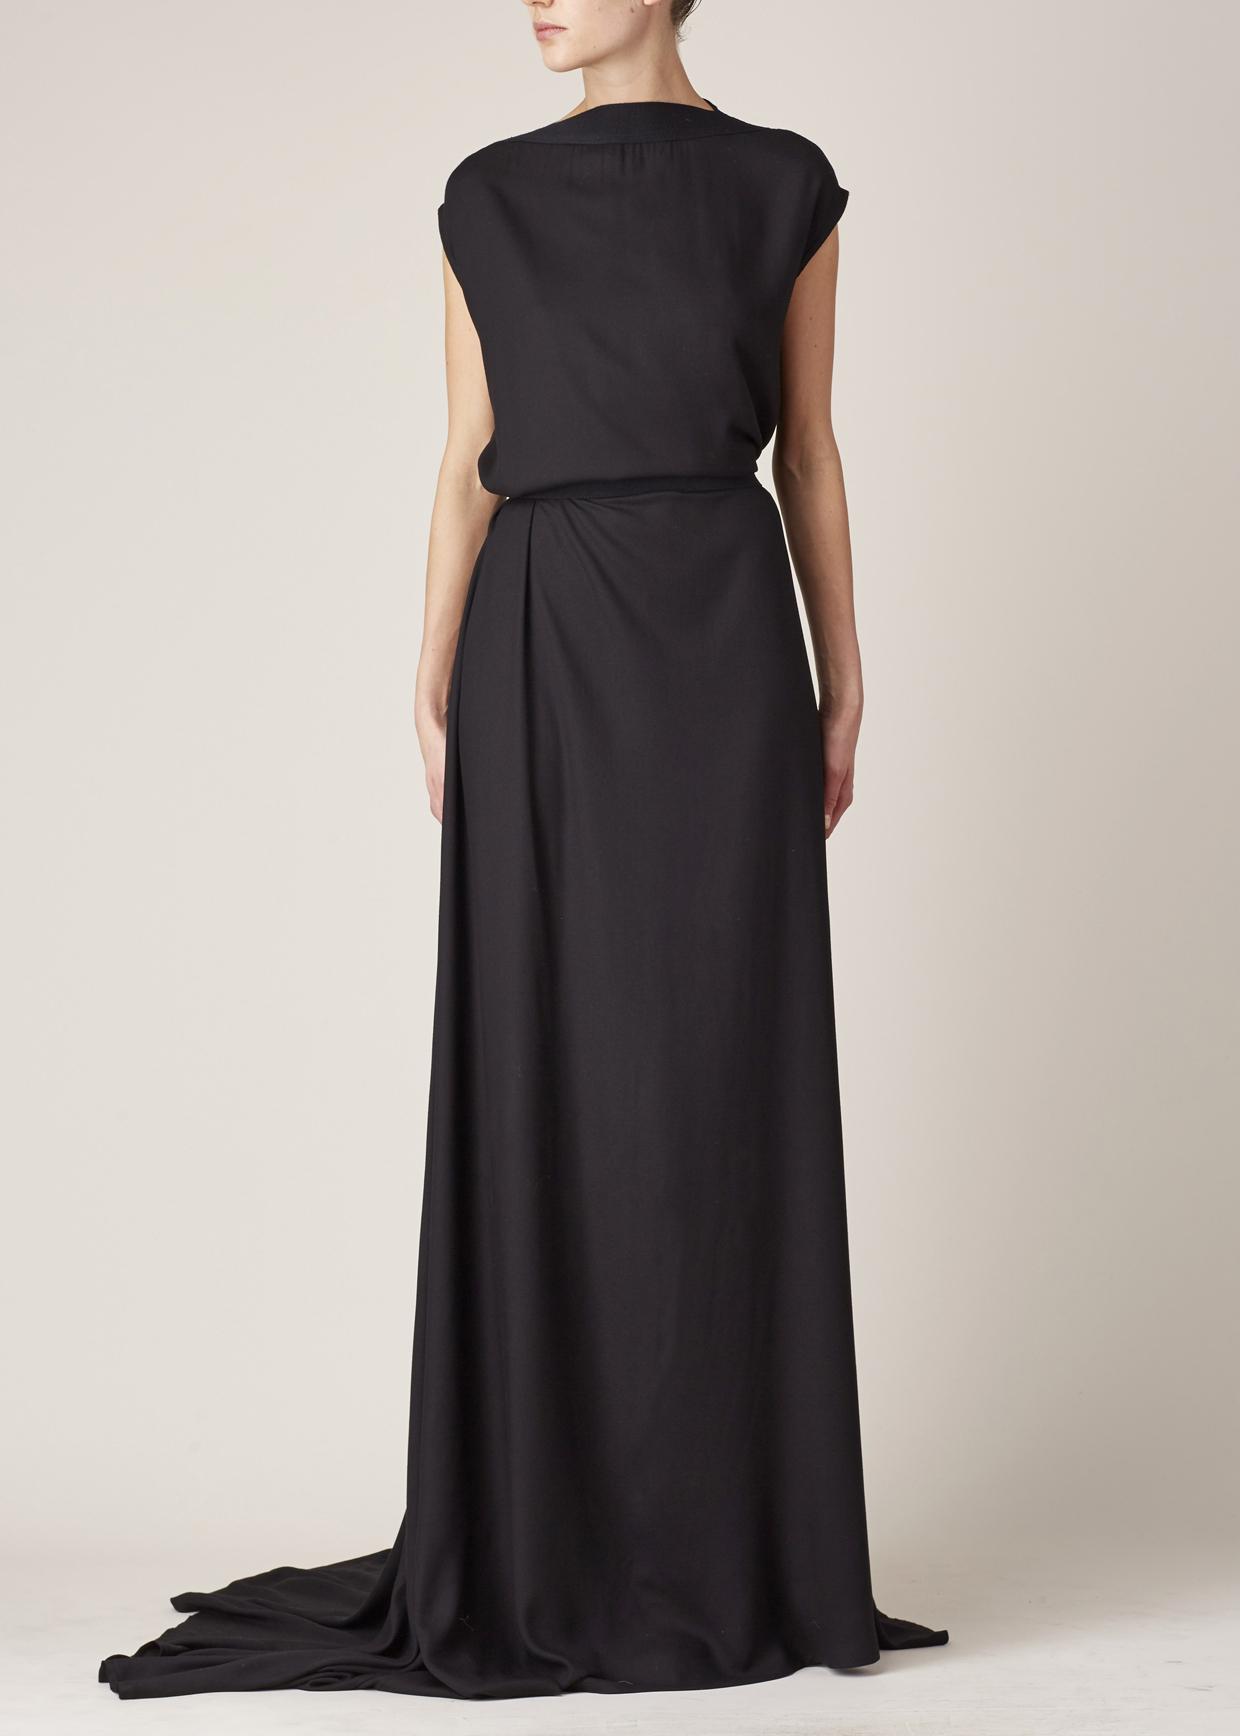 Lyst Ann Demeulemeester Black Infinity Dress In Black